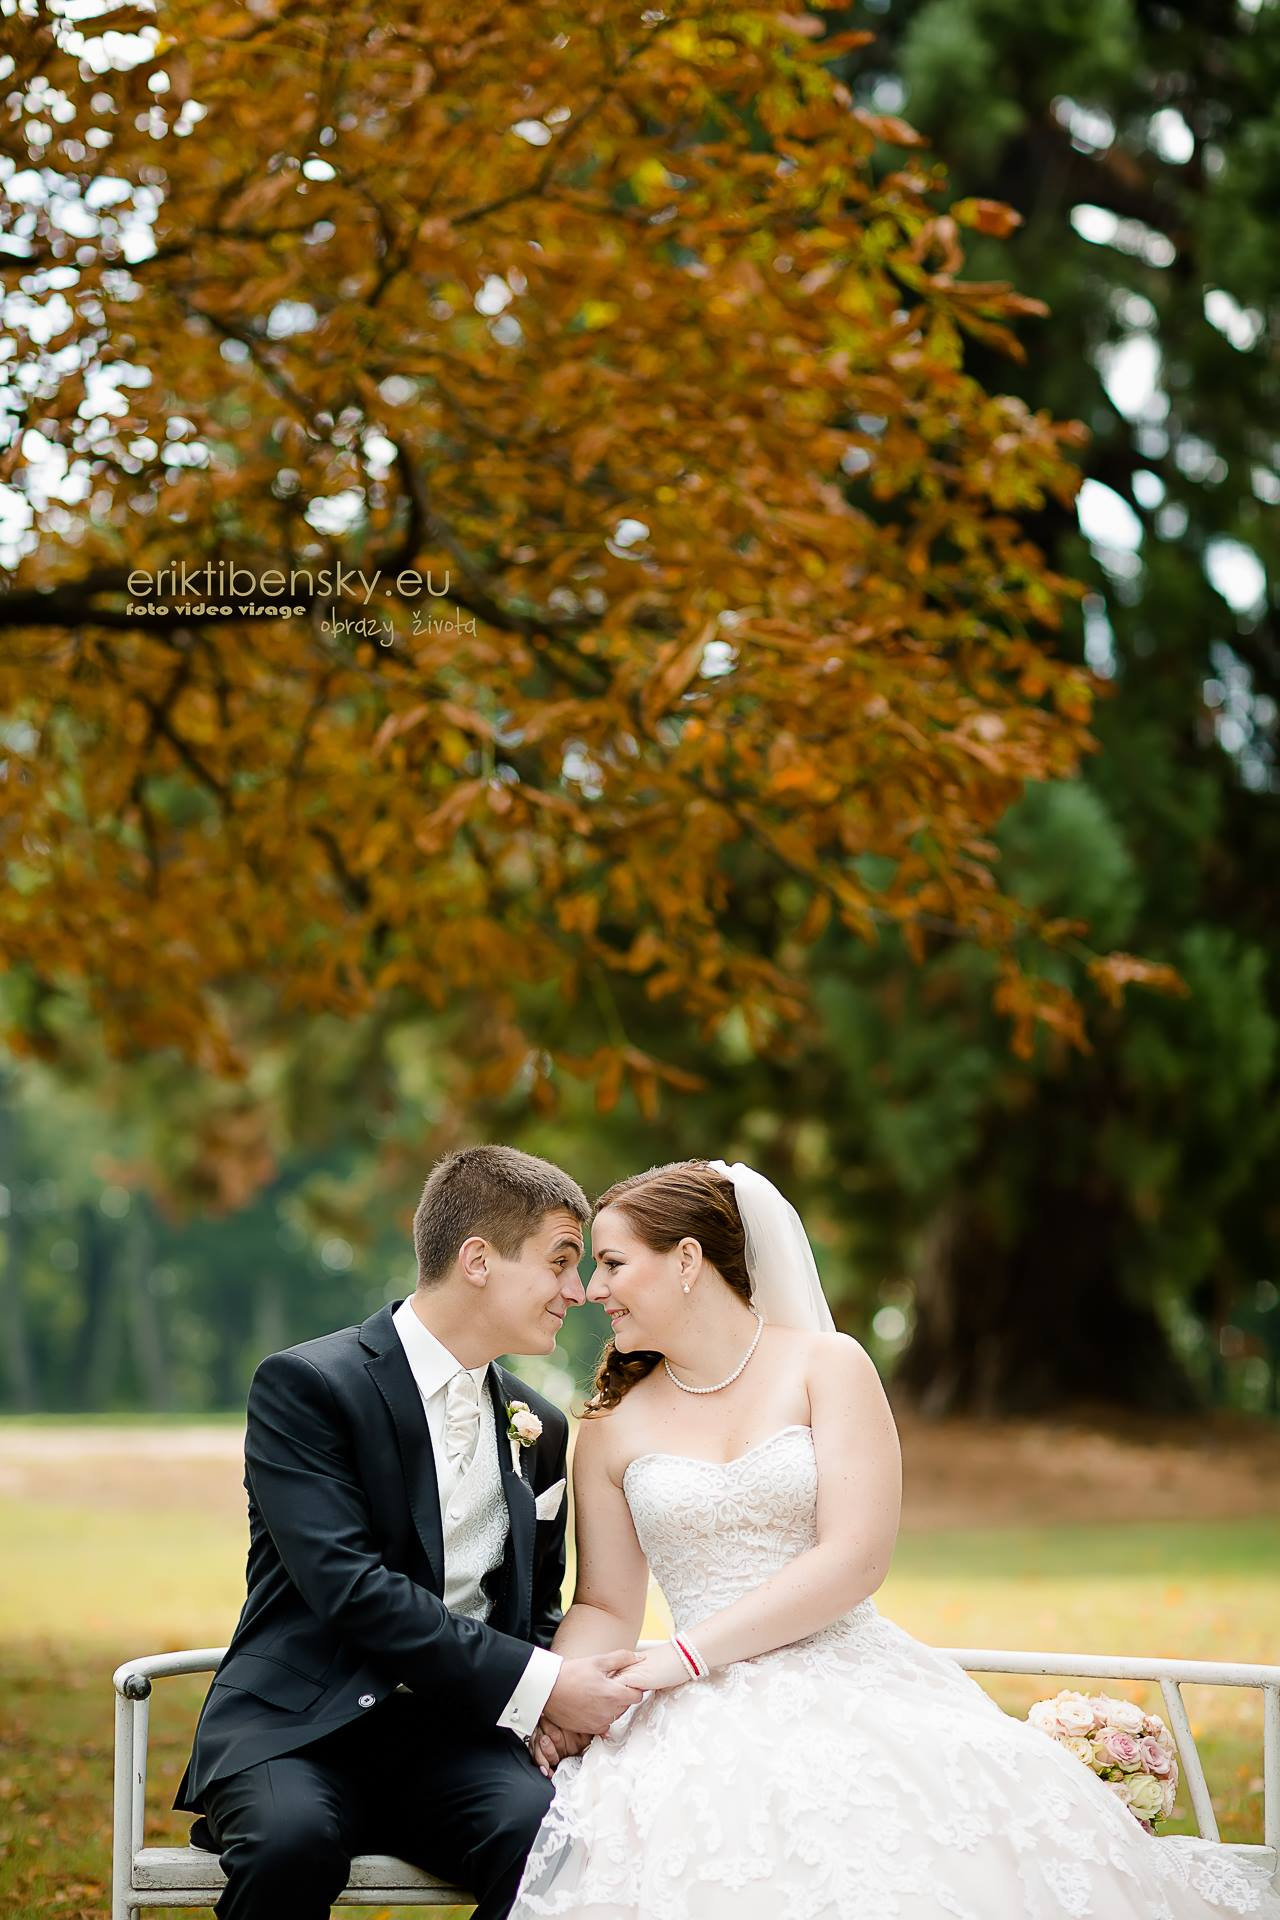 eriktibensky-eu-svadobny-fotograf-wedding-photographer-3085